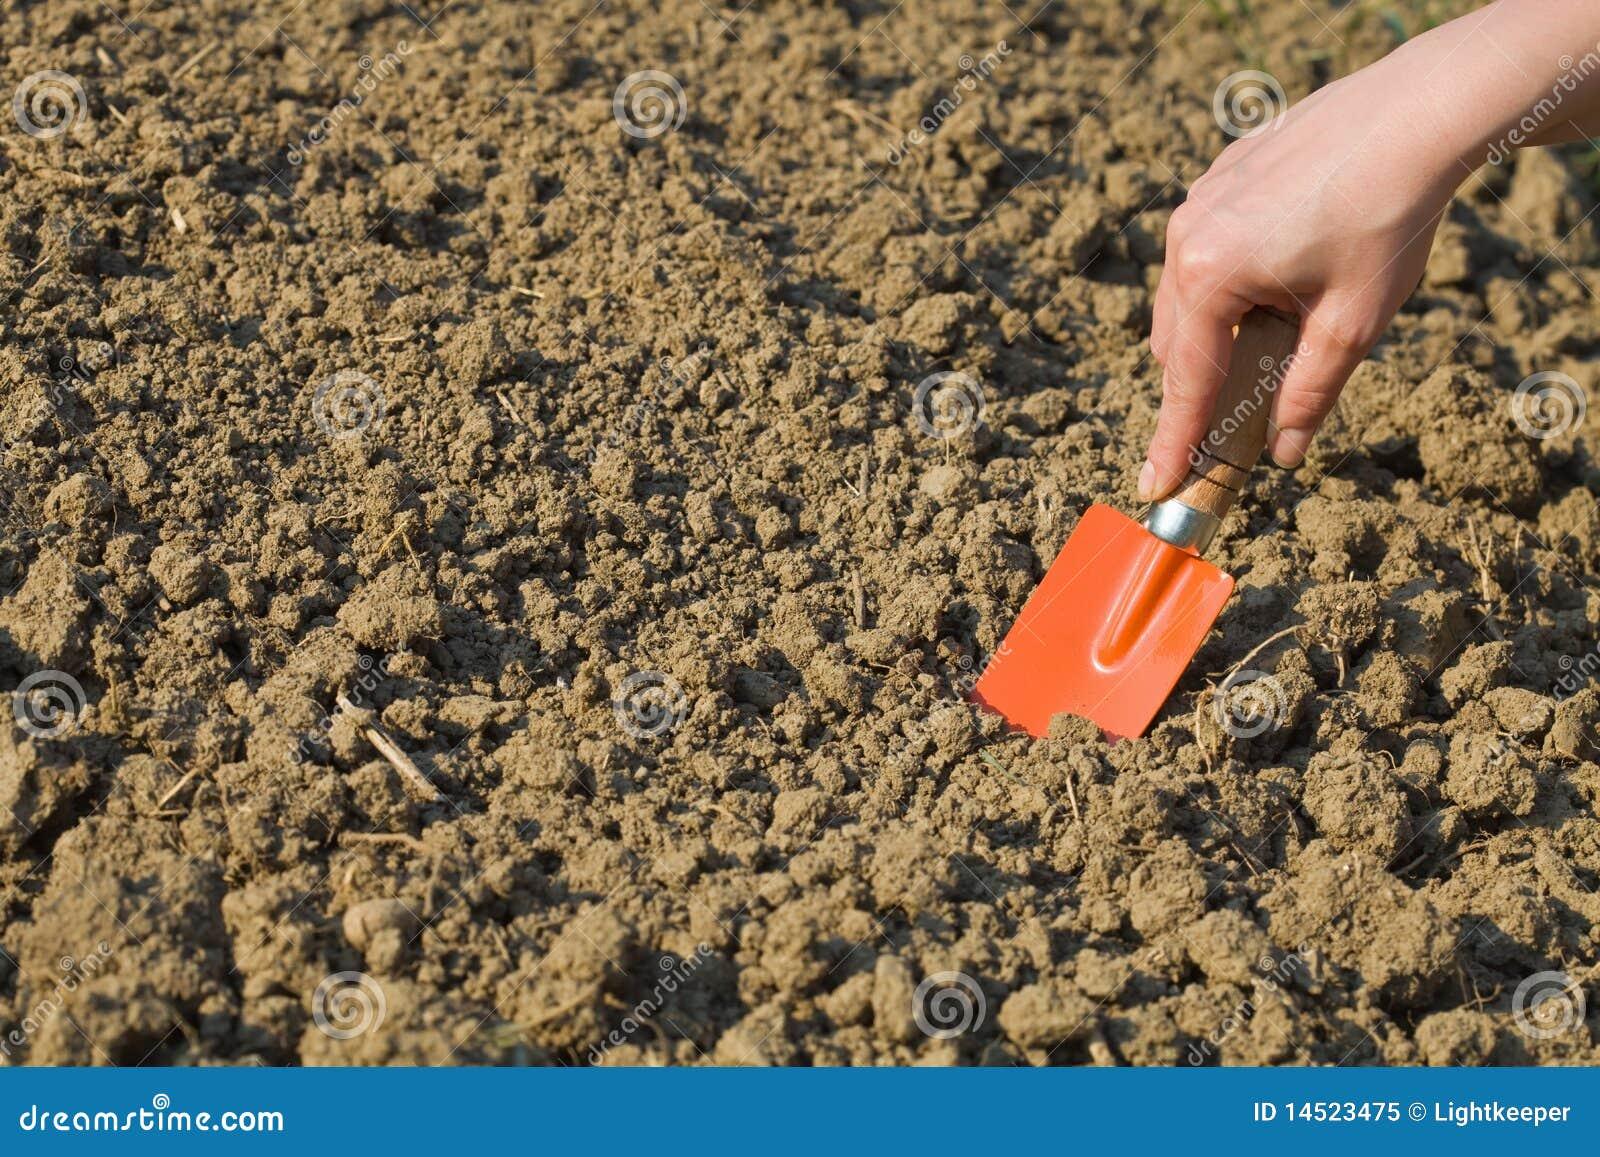 Woman preparing soil for spring gardening royalty free for Soil 7t7 woman